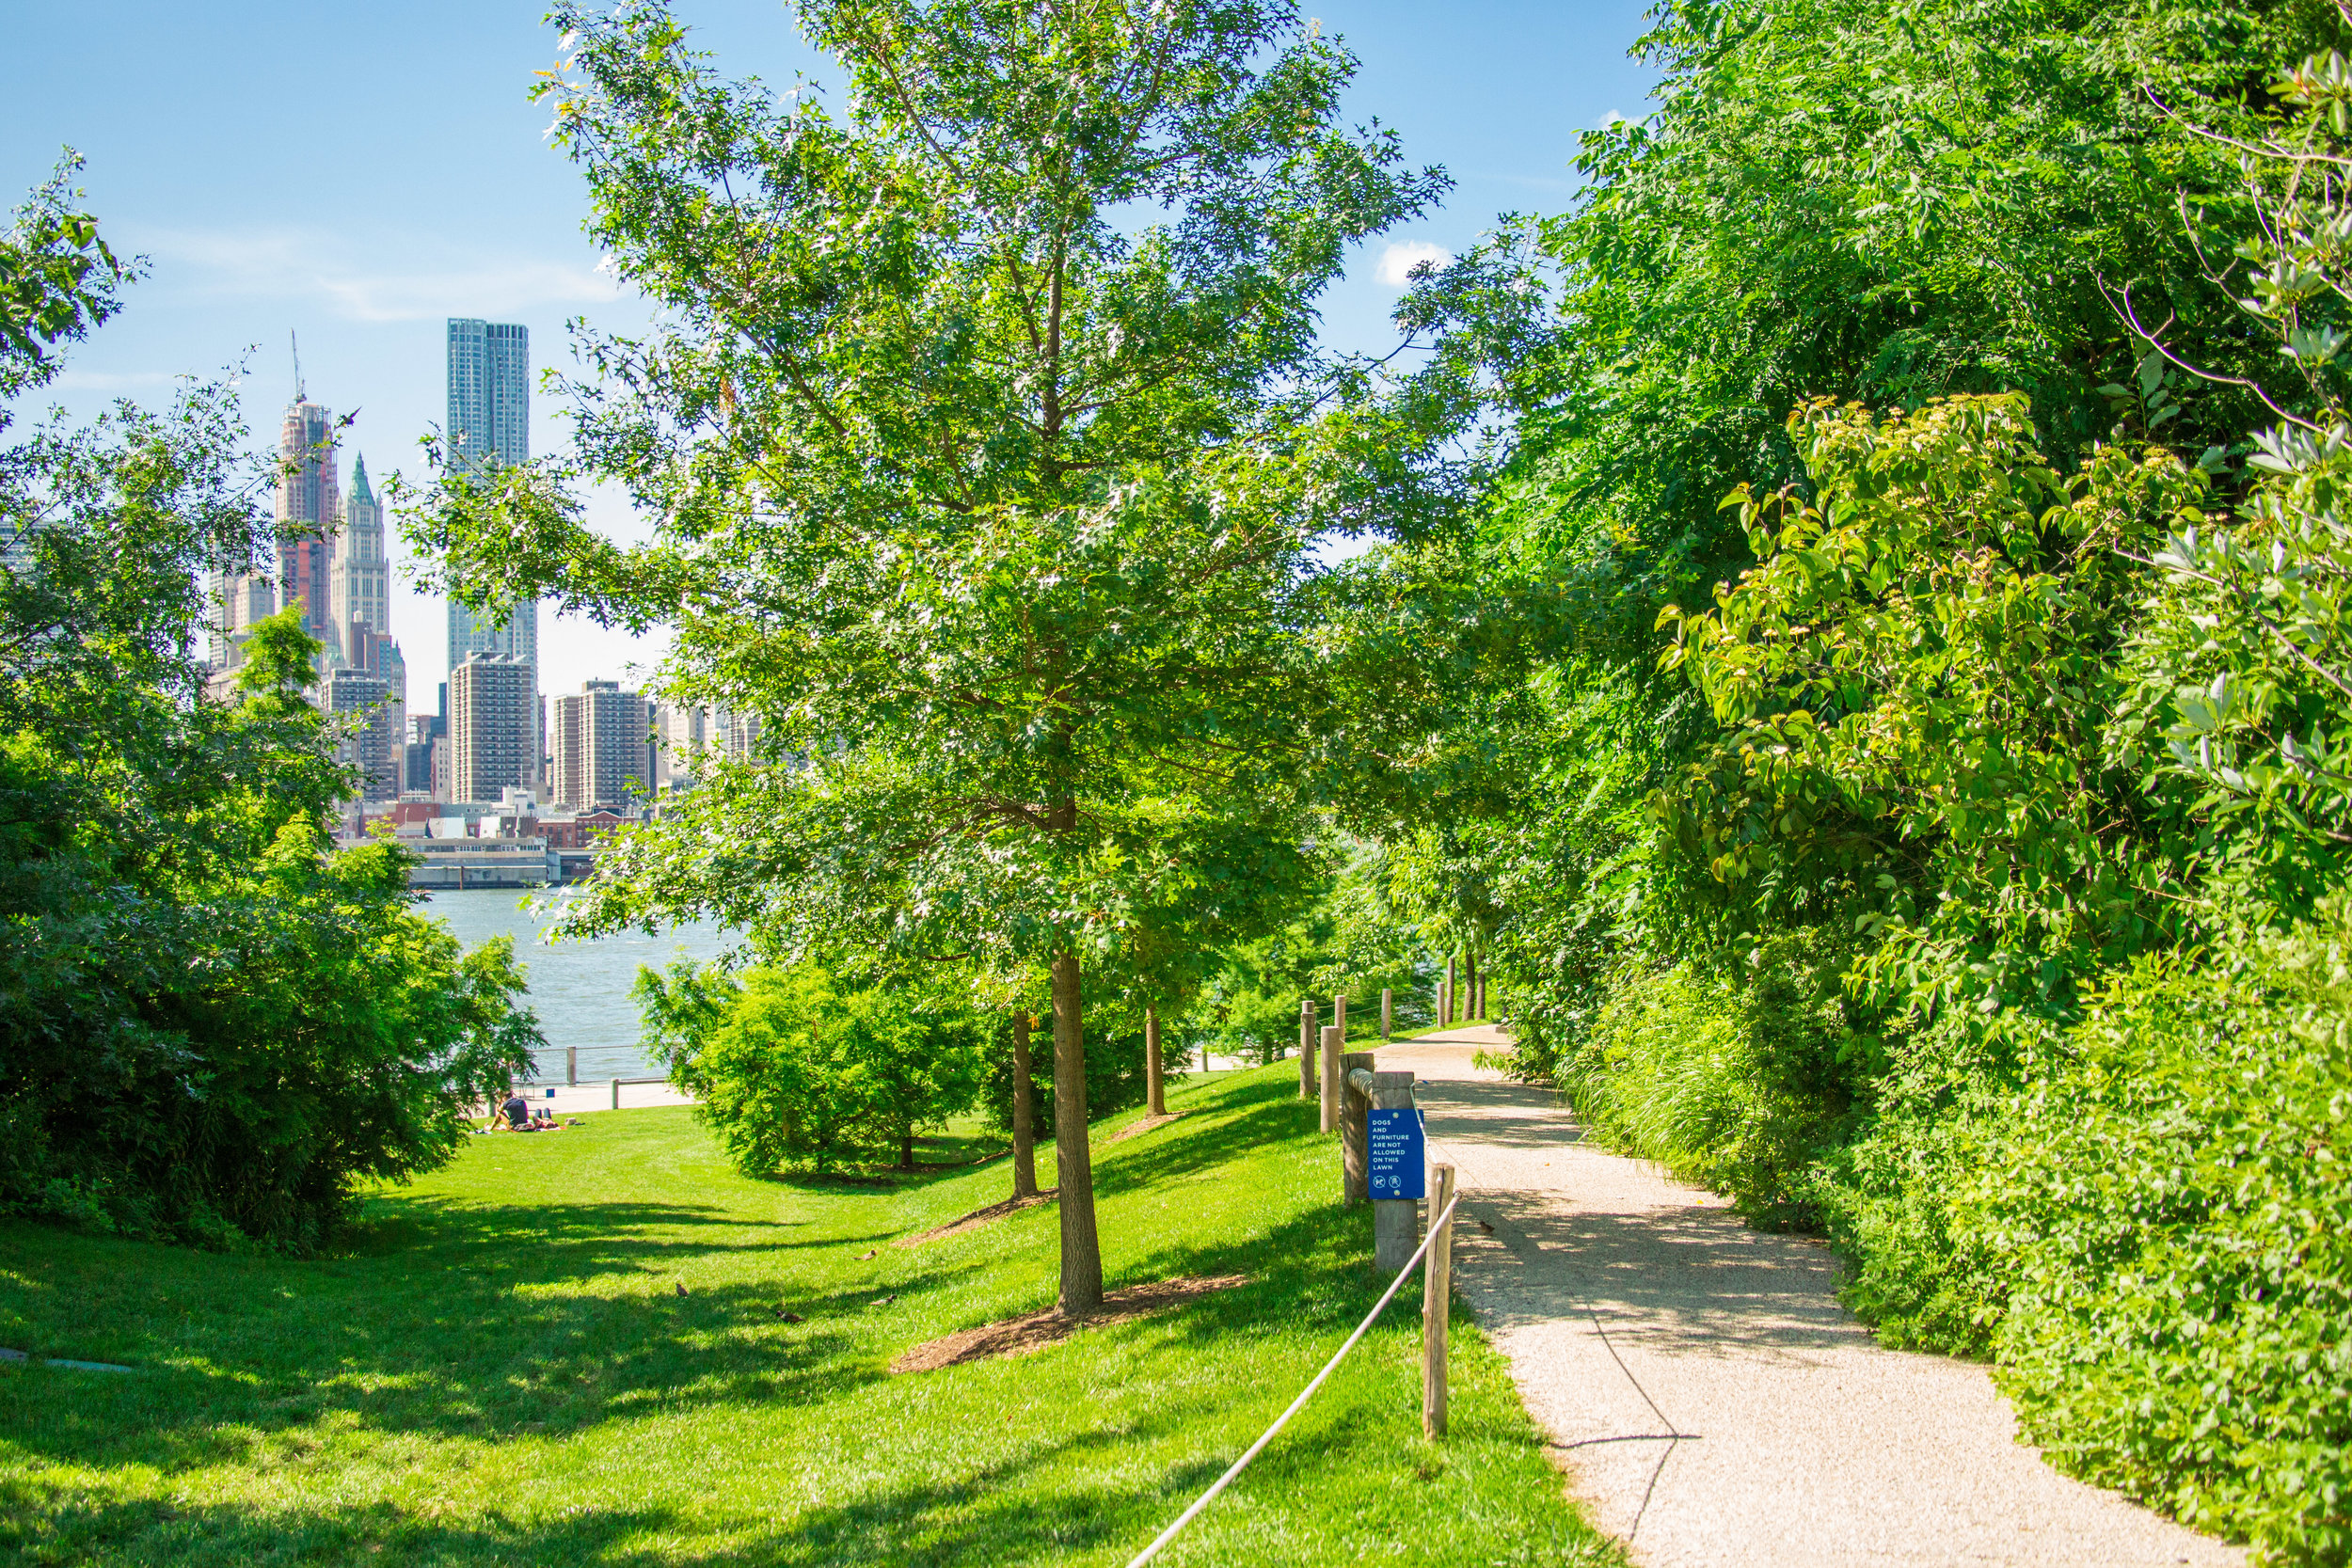 LSNY_Brooklyn_Bridge_Park-75.jpg